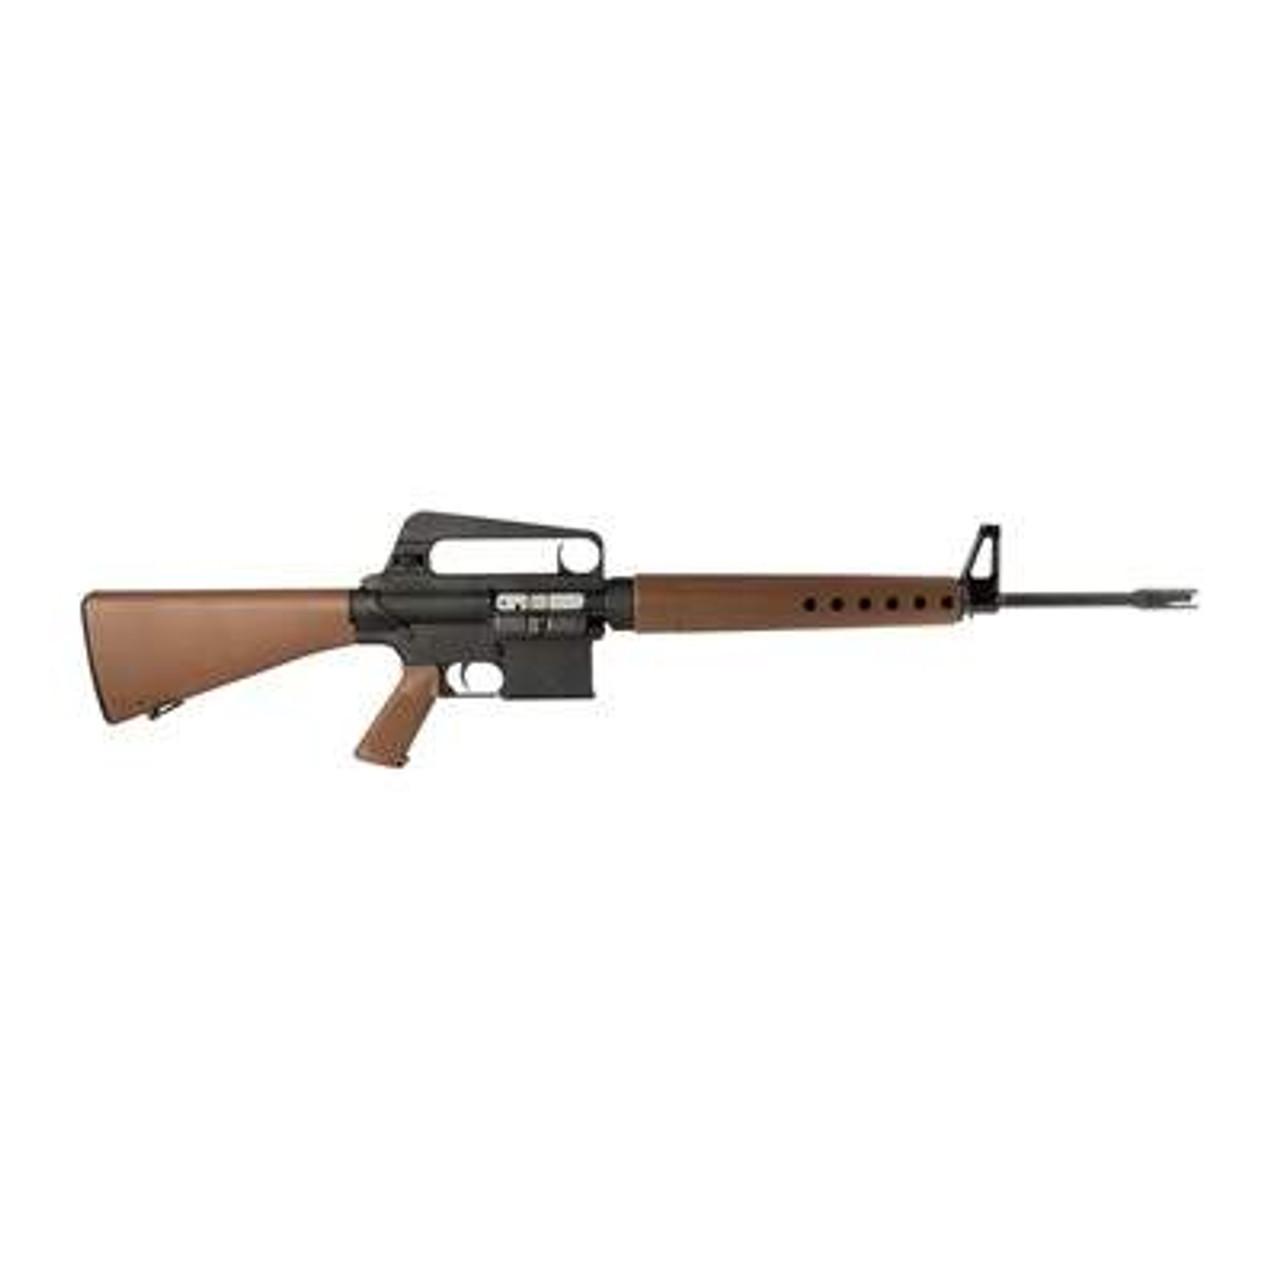 Brownells BRN 10 Retro Rifle CALIFORNIA LEGAL - .308